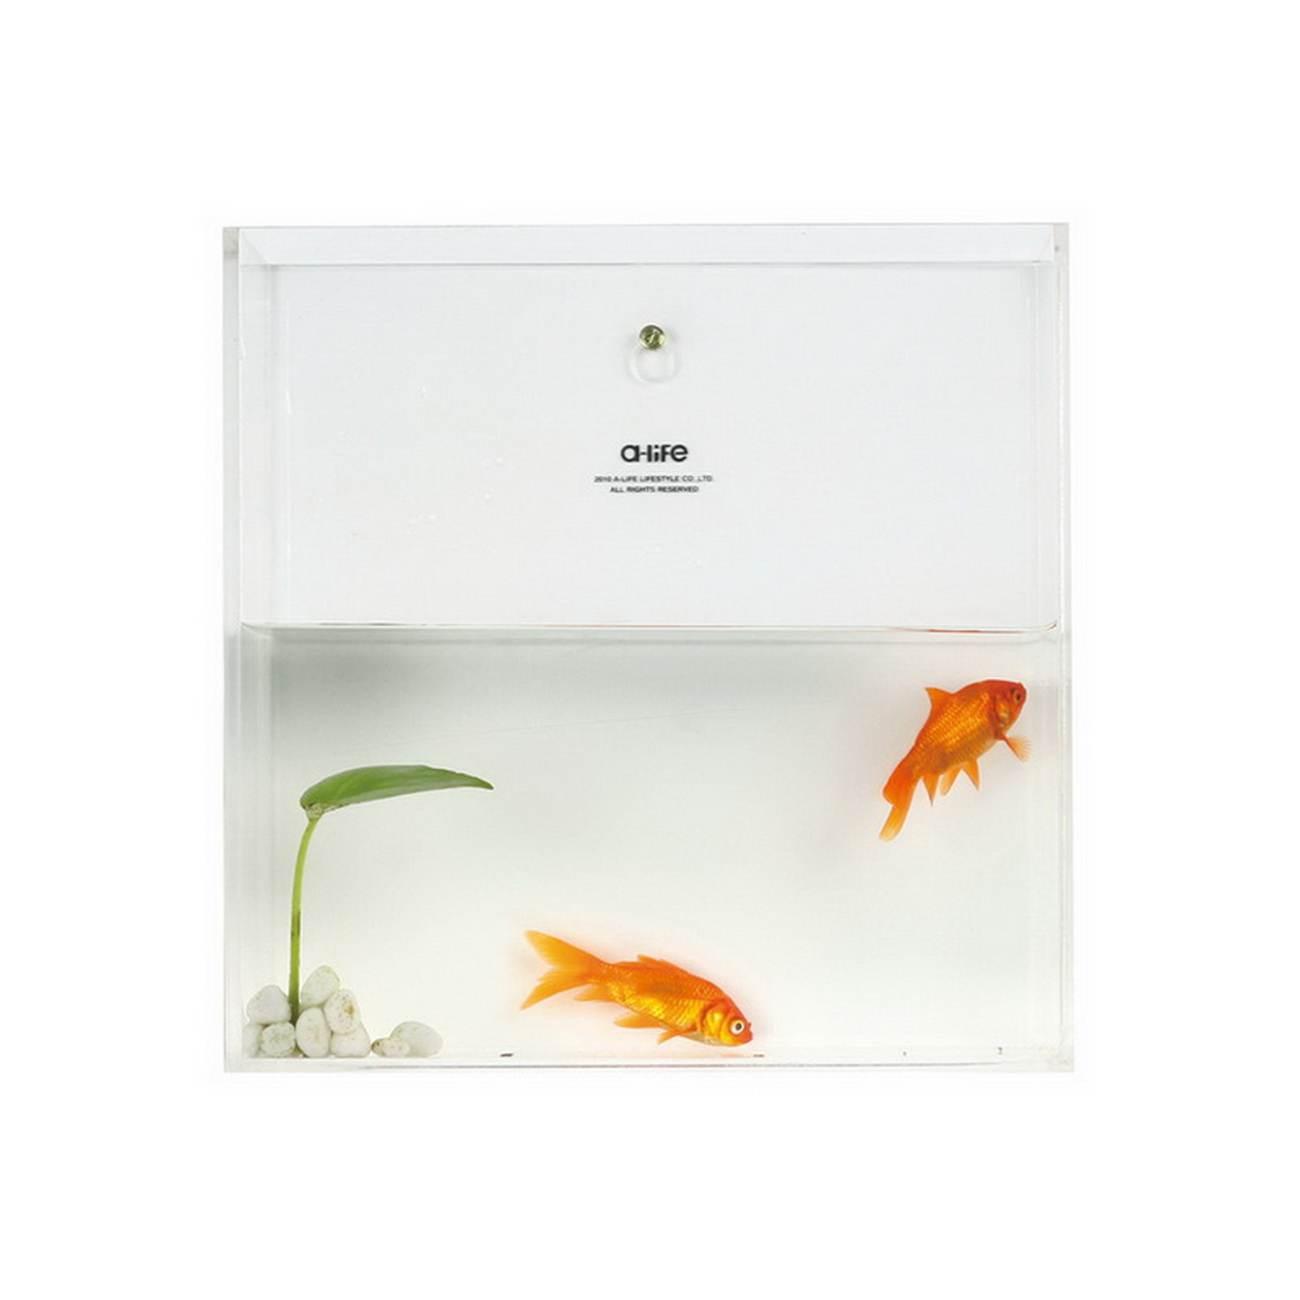 a-life 最生活悬挂式亚克力鱼缸方形 透明 c-1908